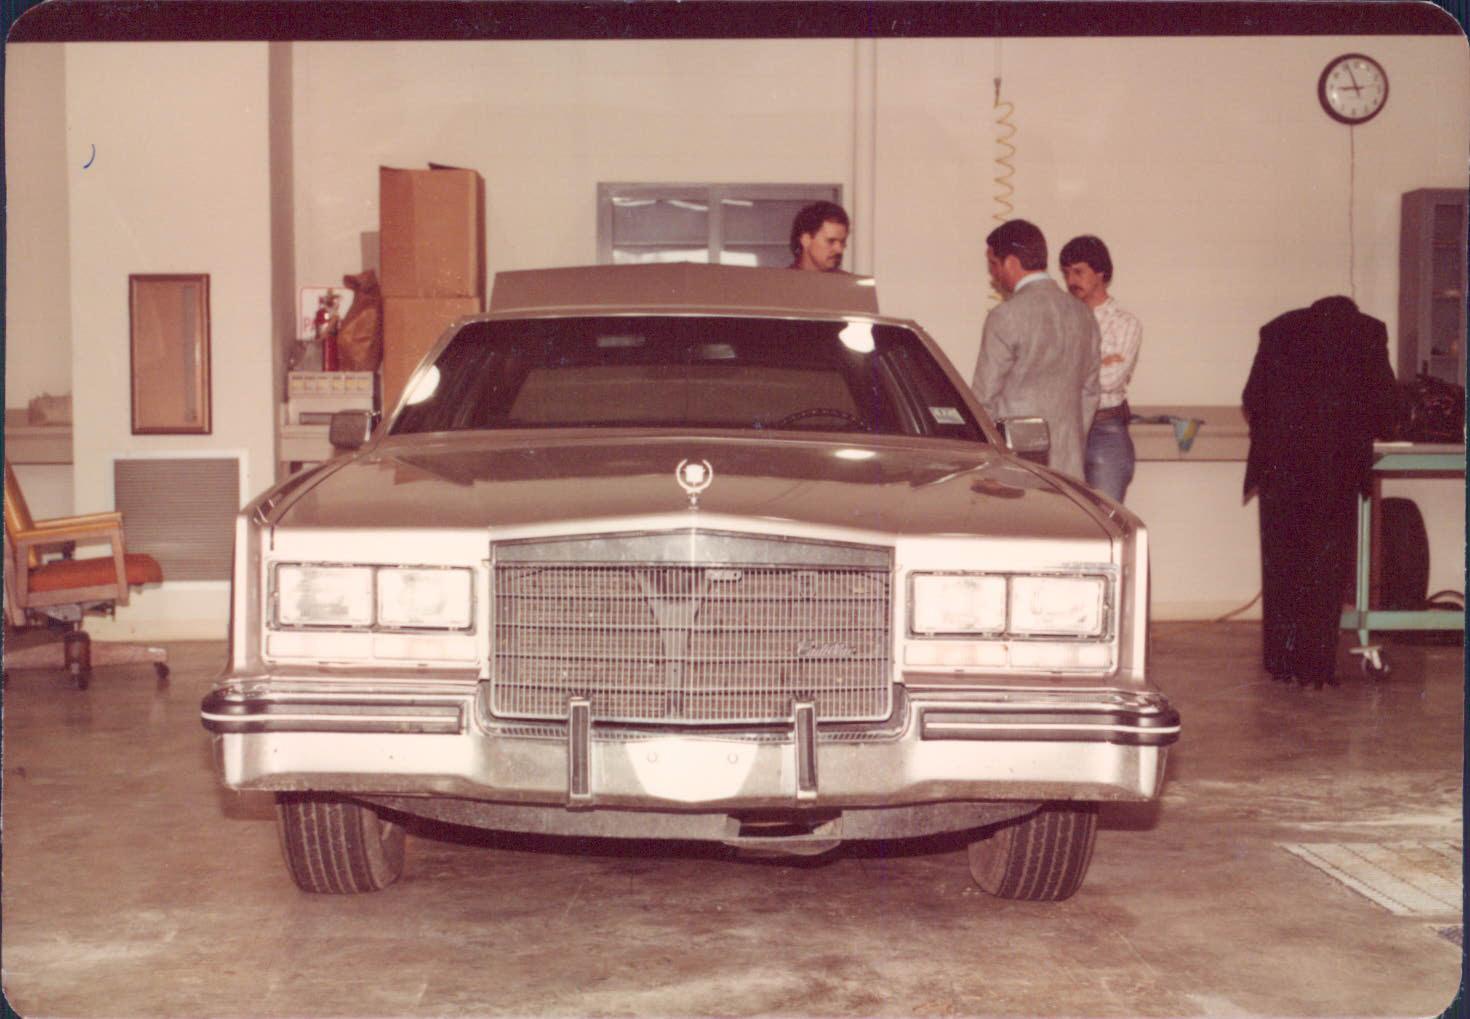 Gary Kergan's 1984 Cadillac Eldorado